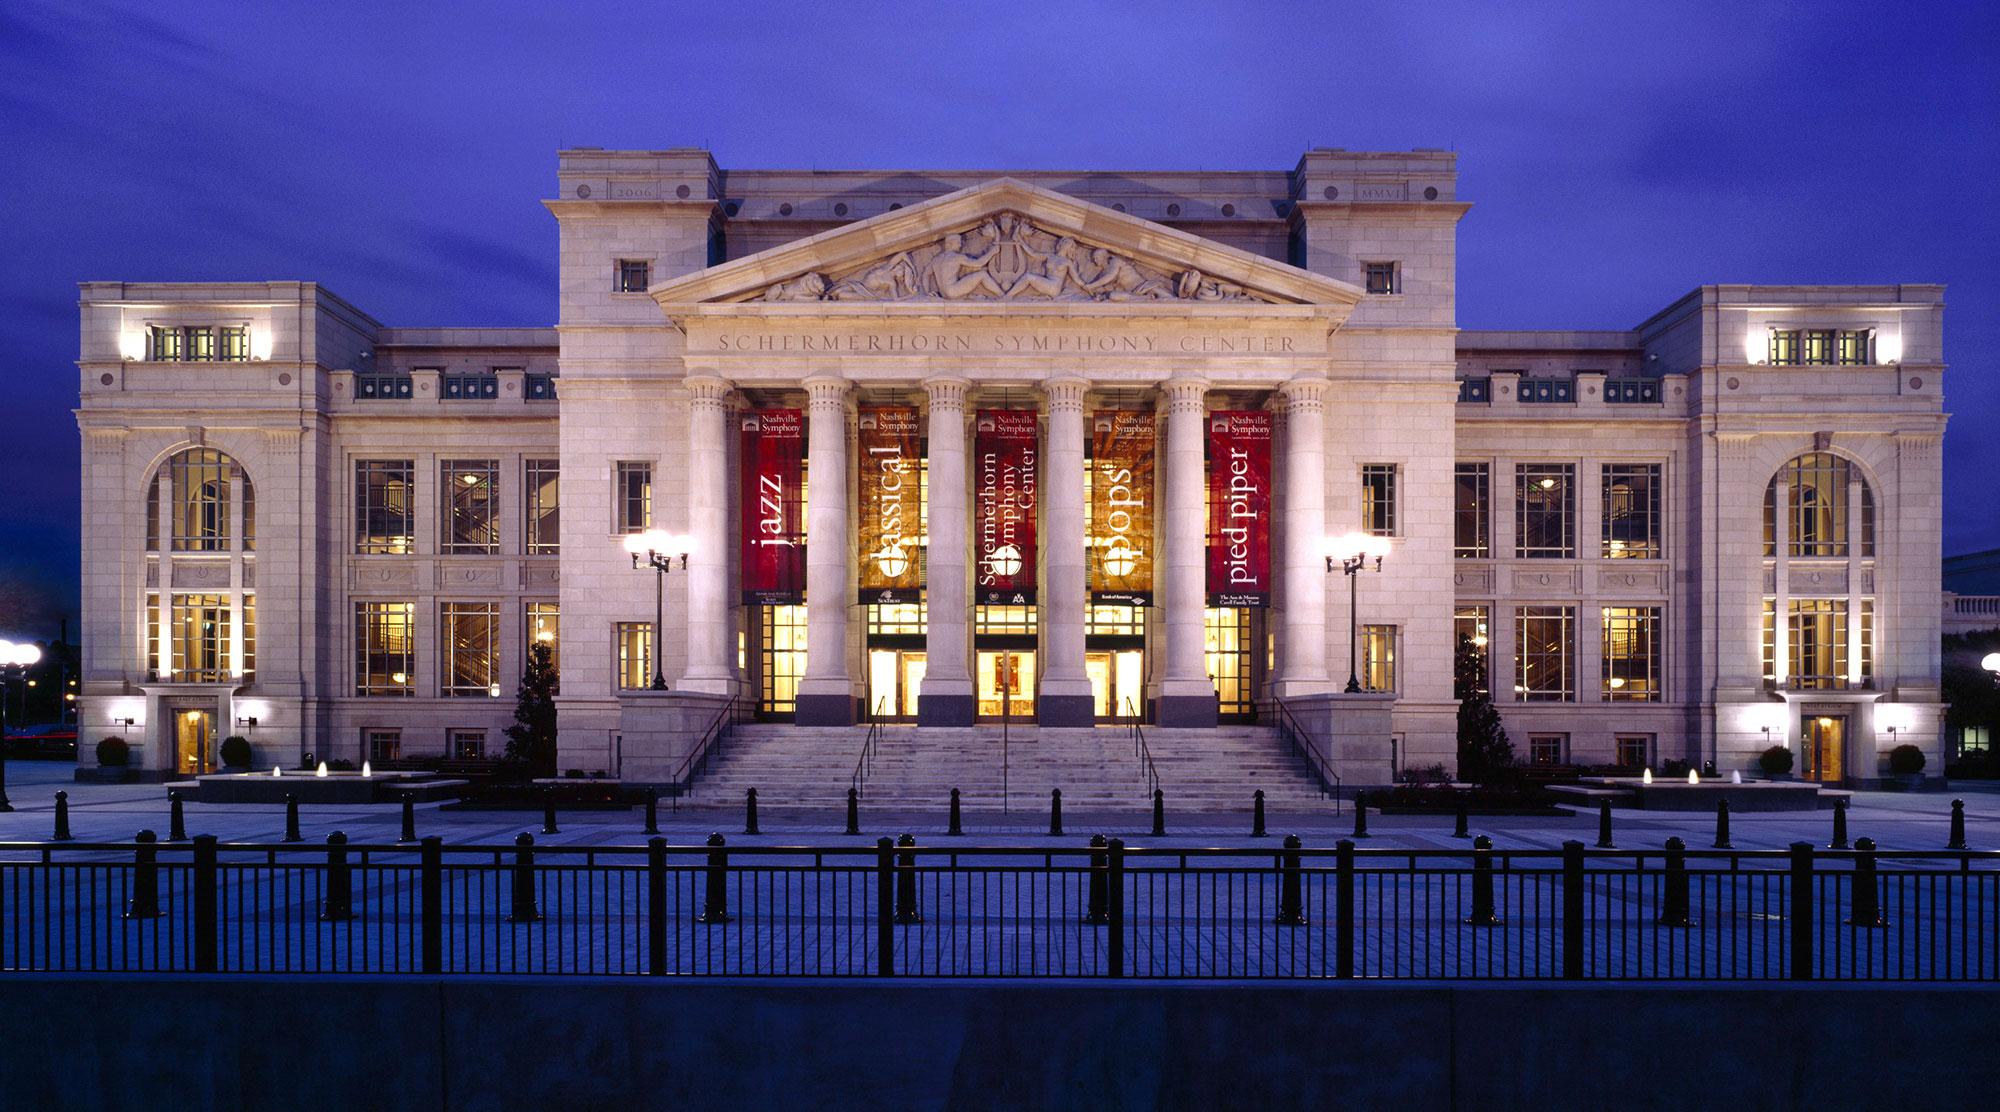 Schermerhorn-Symphony-Center-Nash-CVB